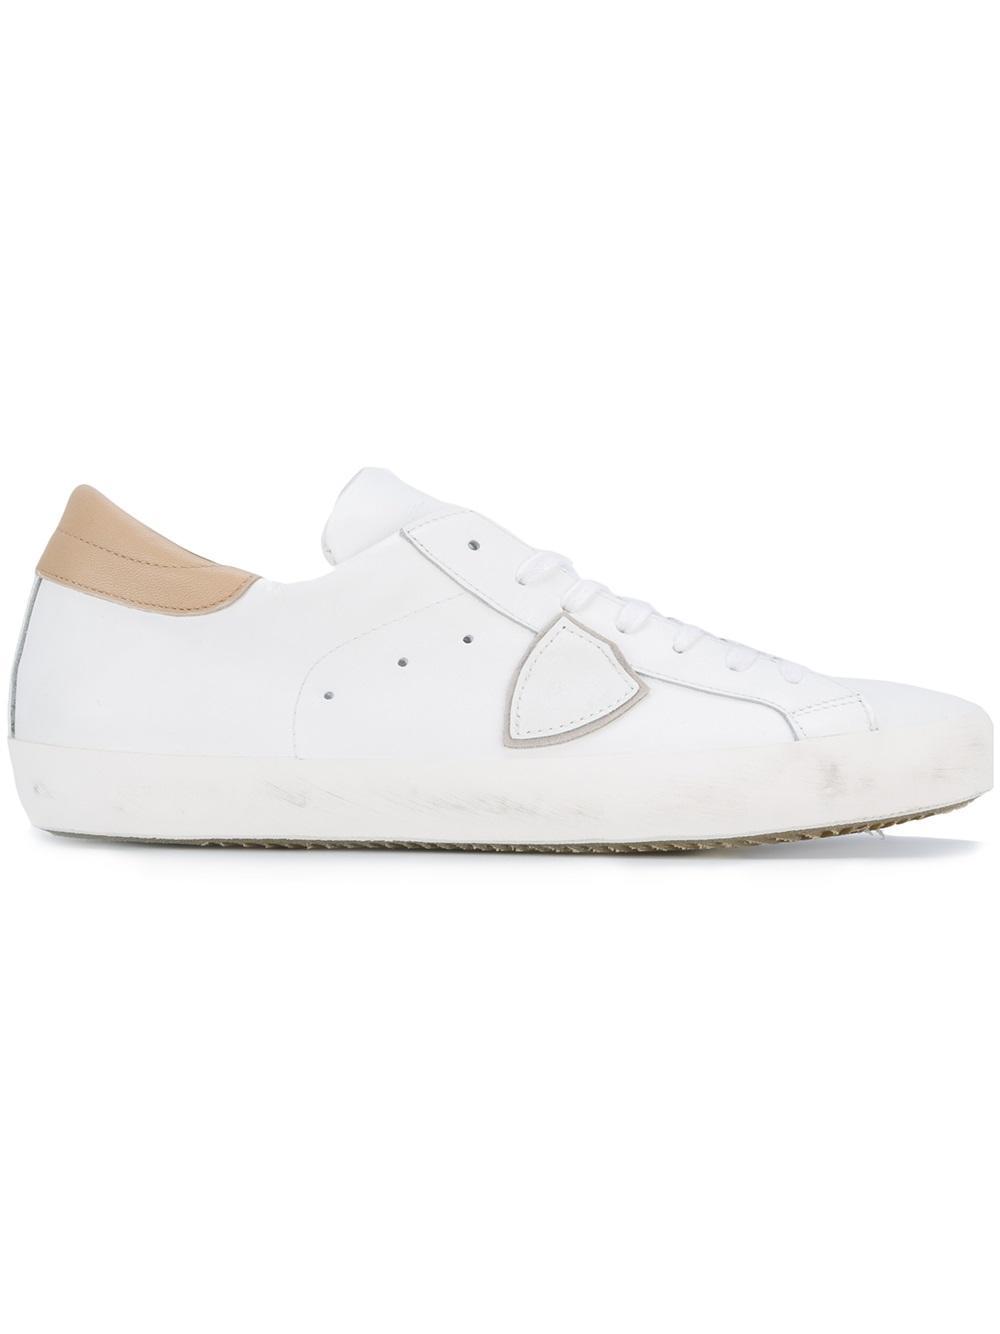 1000x1334 Philippe Model Men Shoes Outlet Online 100% Original Quality